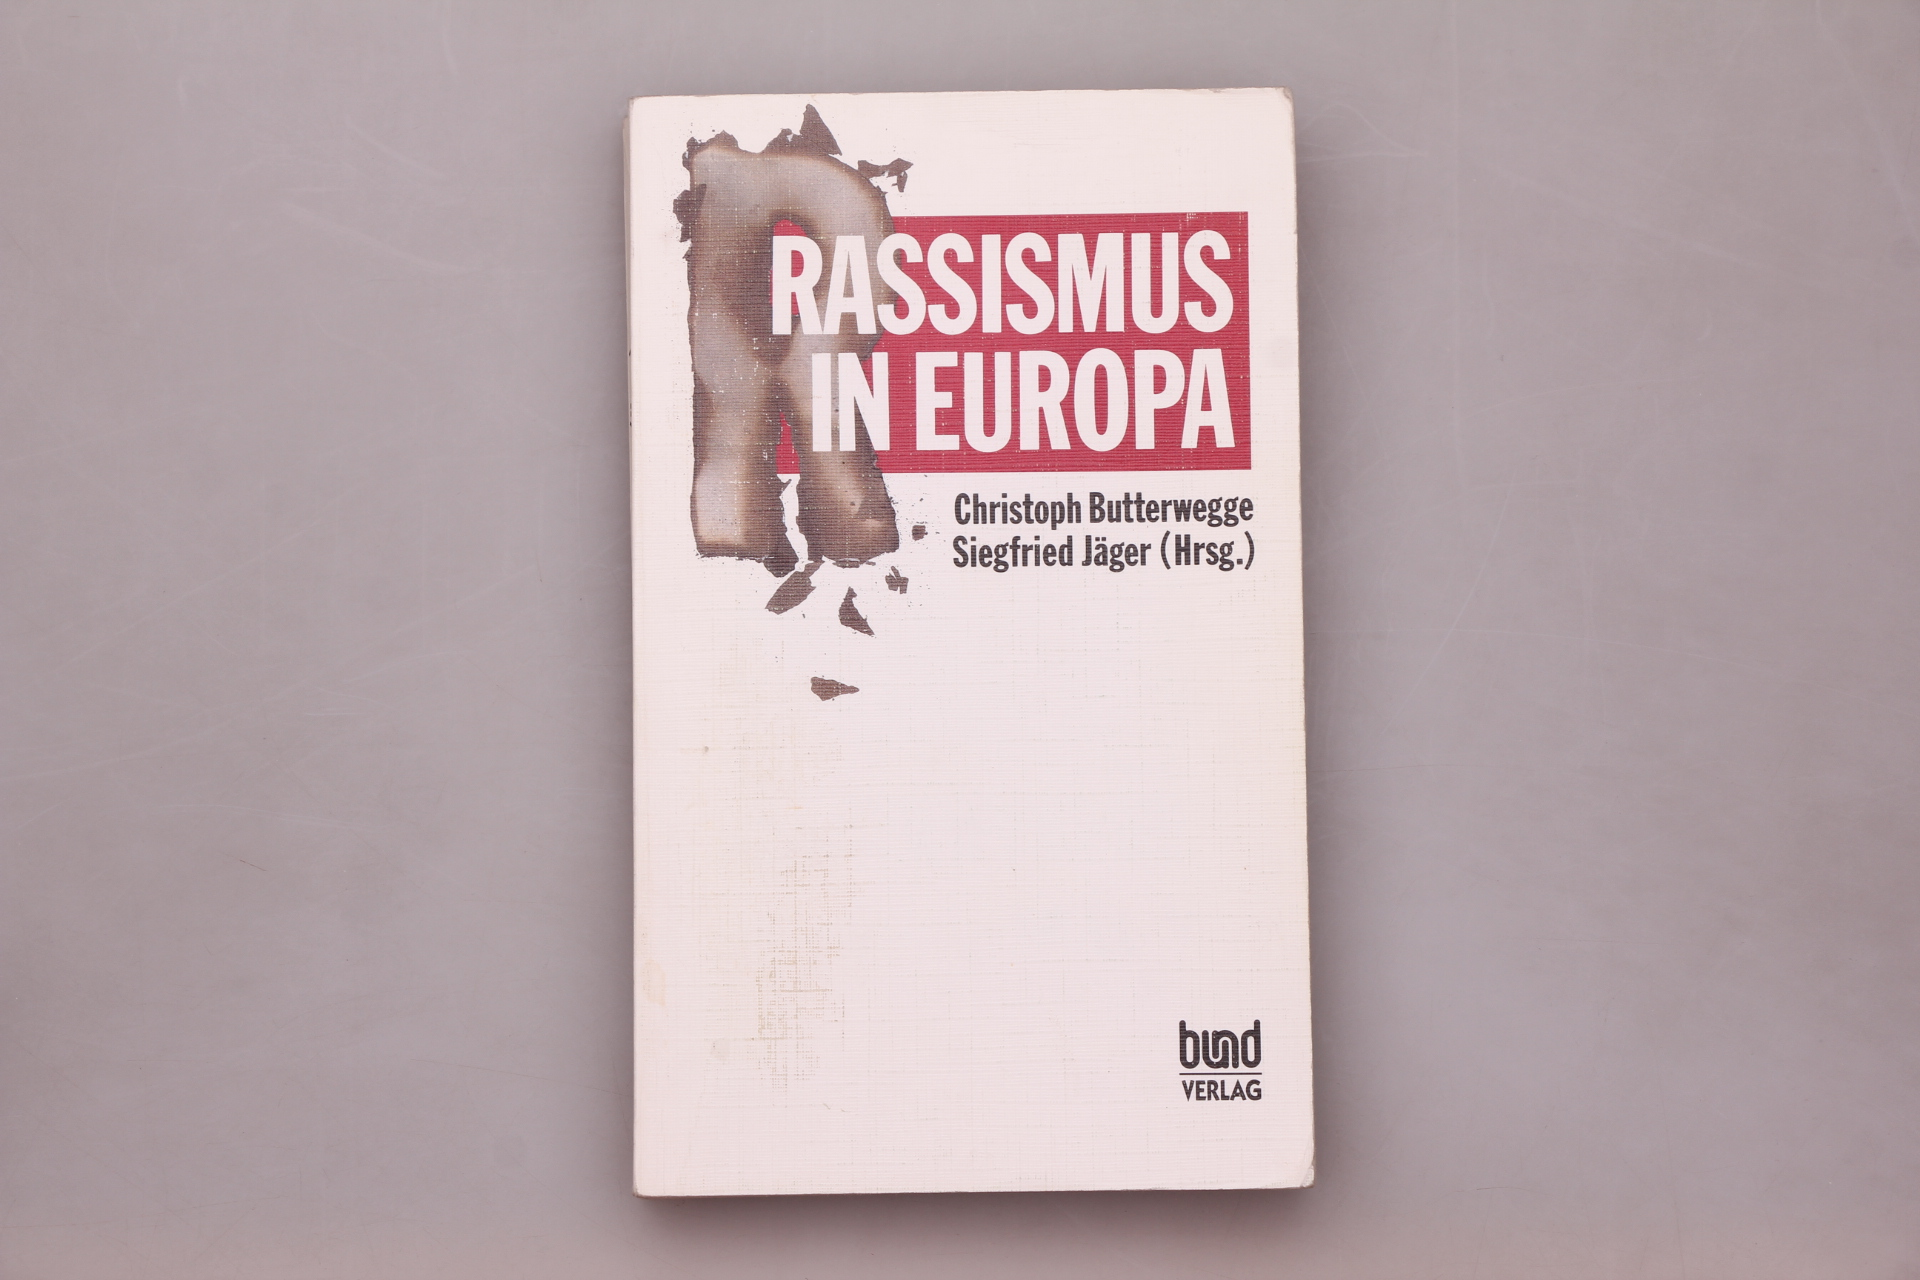 RASSISMUS IN EUROPA